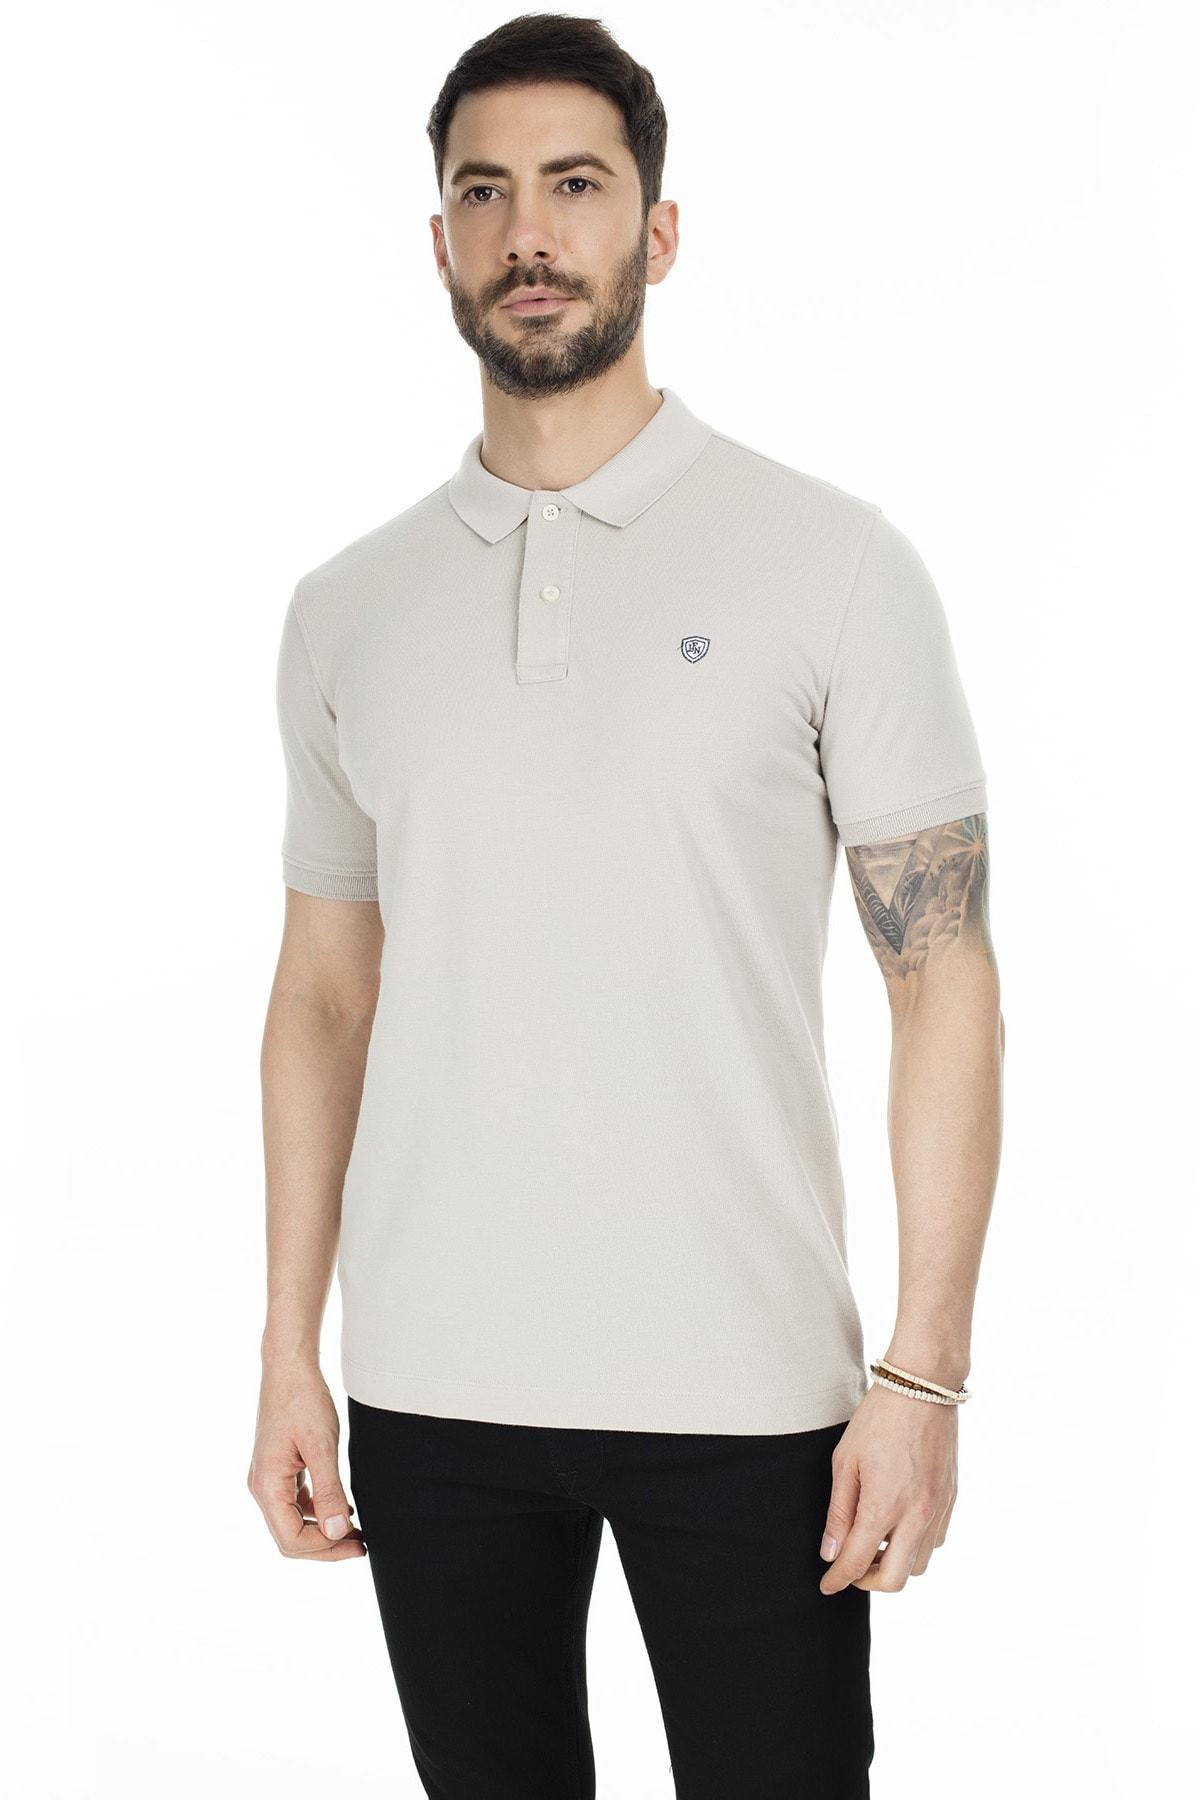 Lufian Laon Spor Polo T- Shirt Taş 2